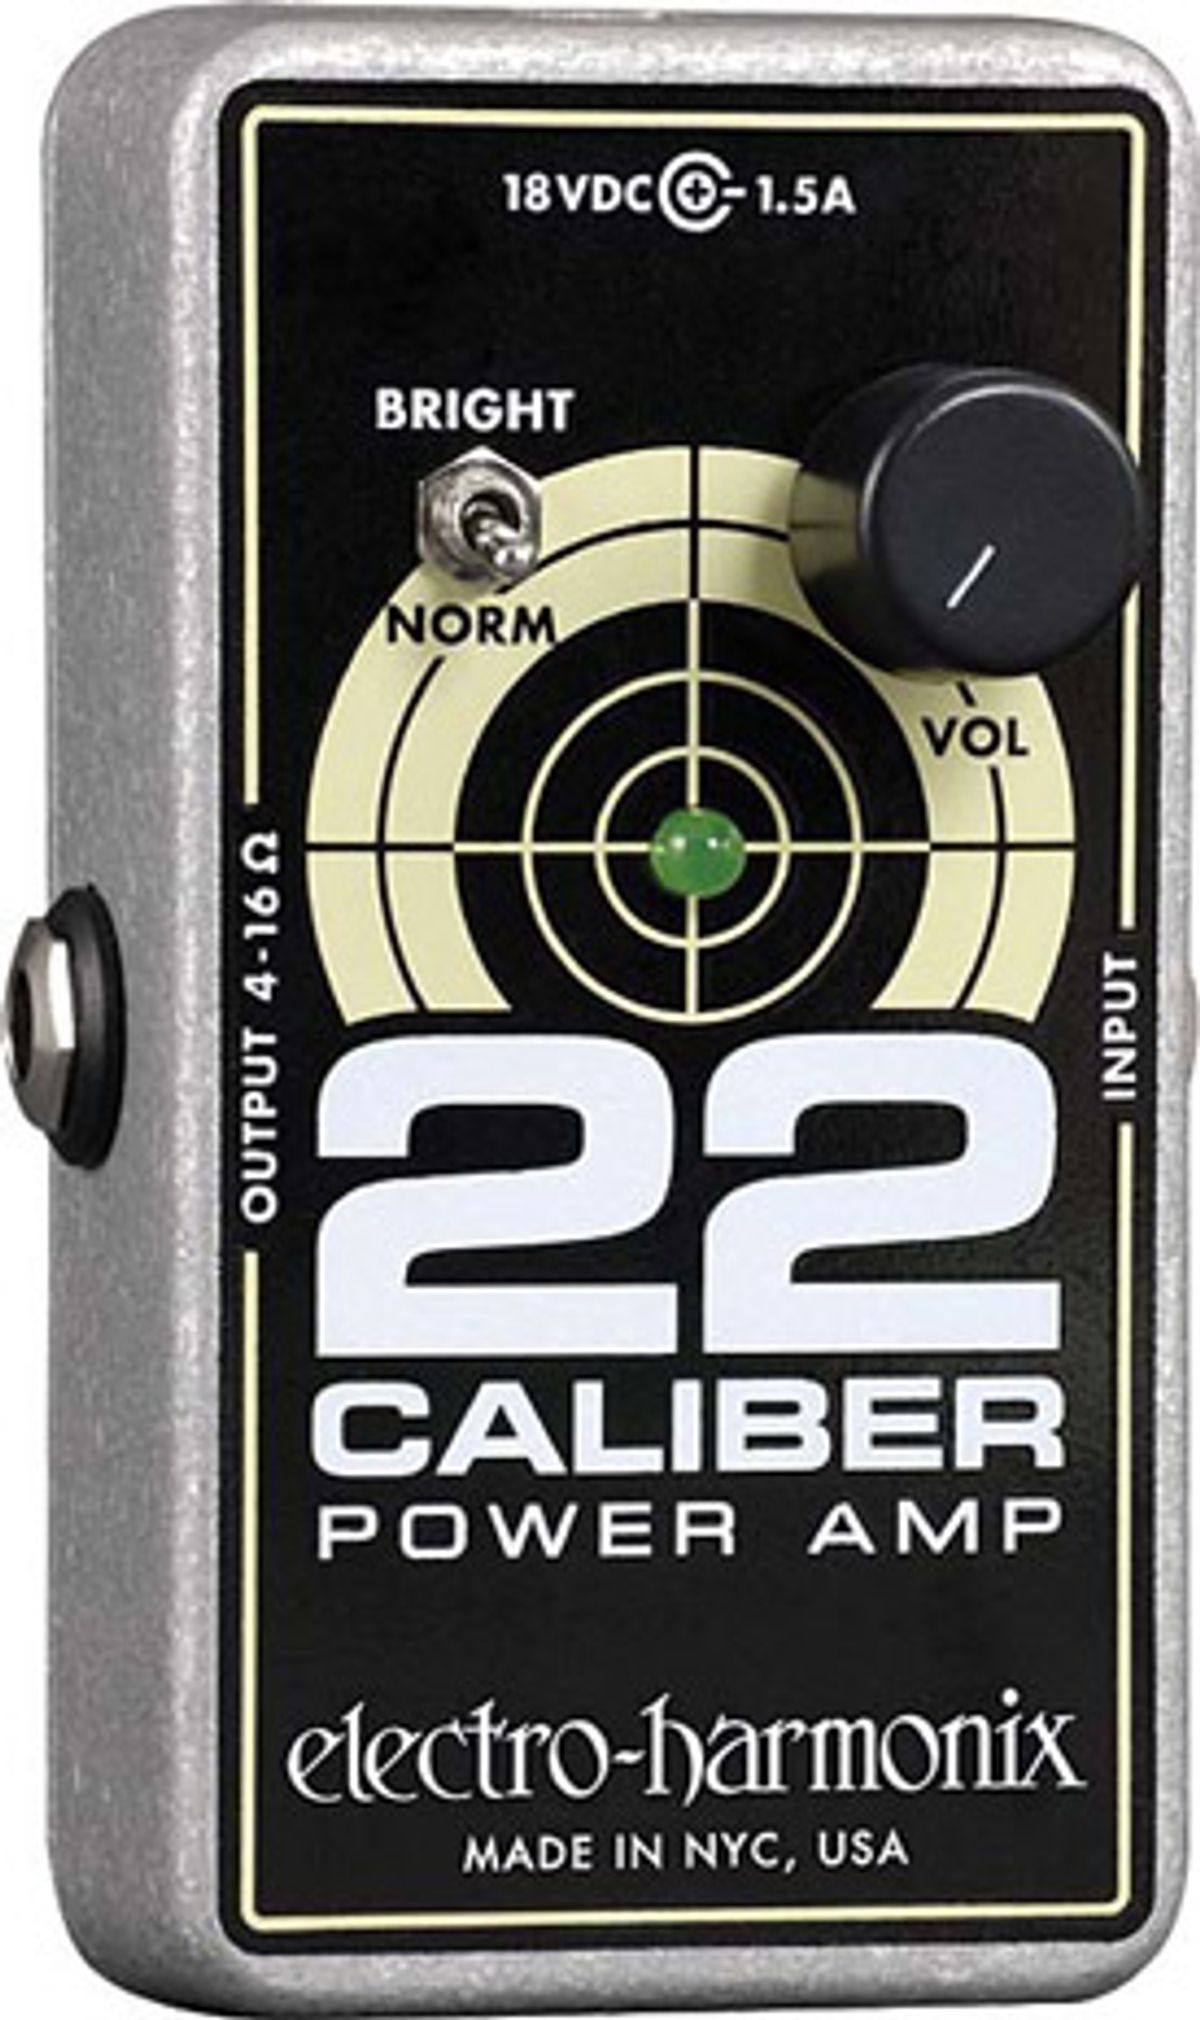 Electro-Harmonix 22 Caliber Power Amp Review